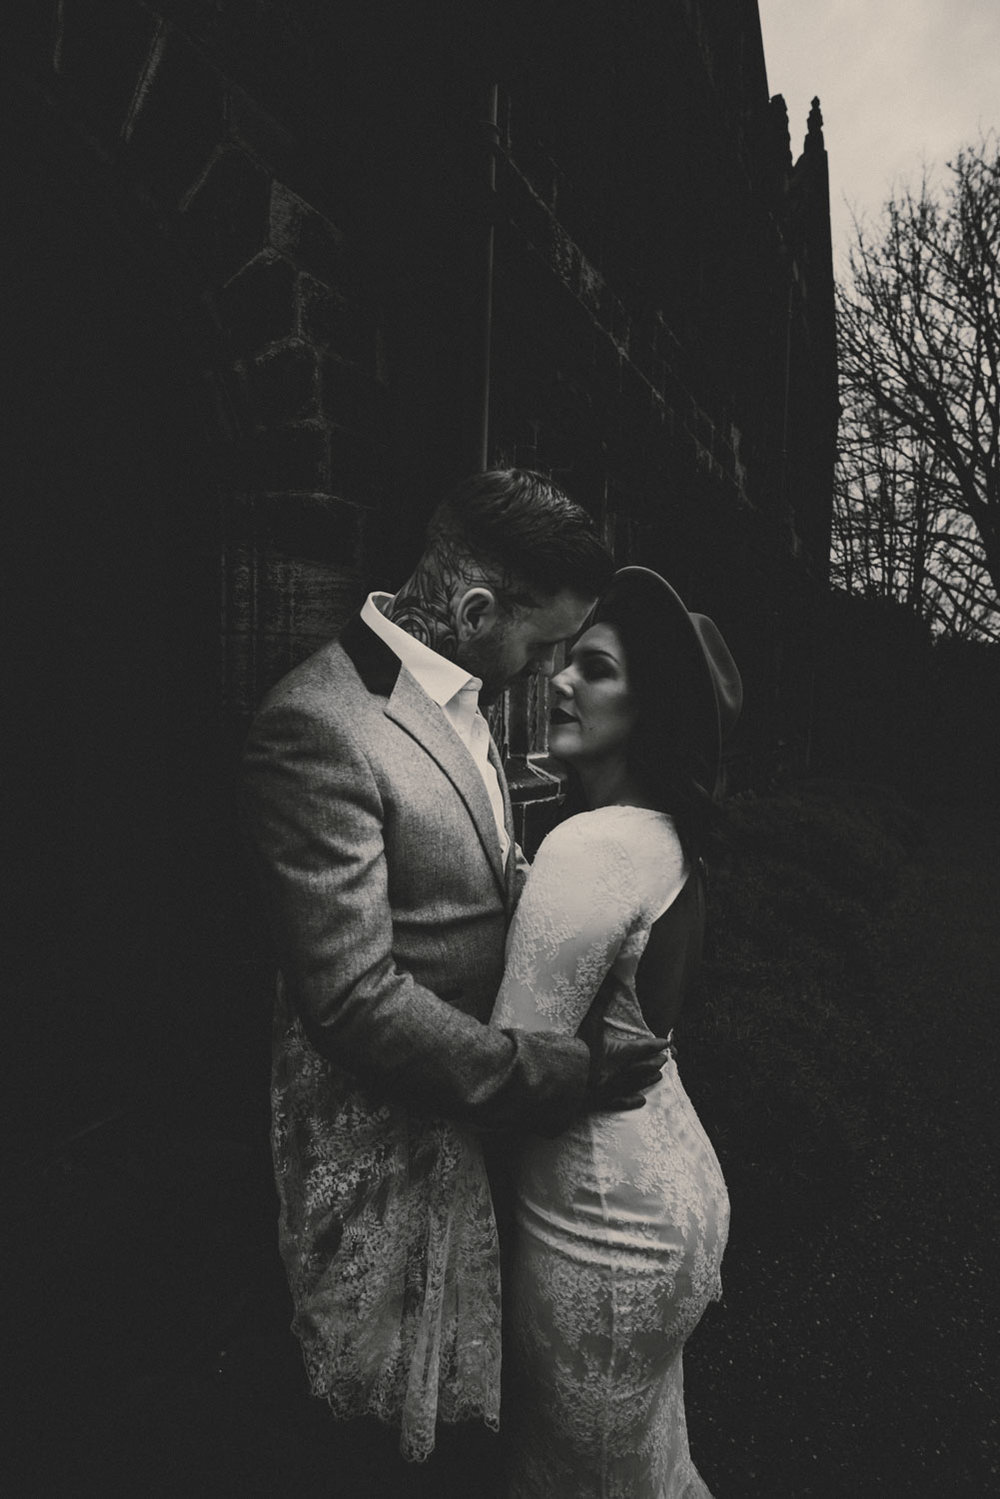 east-riddlesden-hall-wedding-jade-maguire-photography (61).jpg